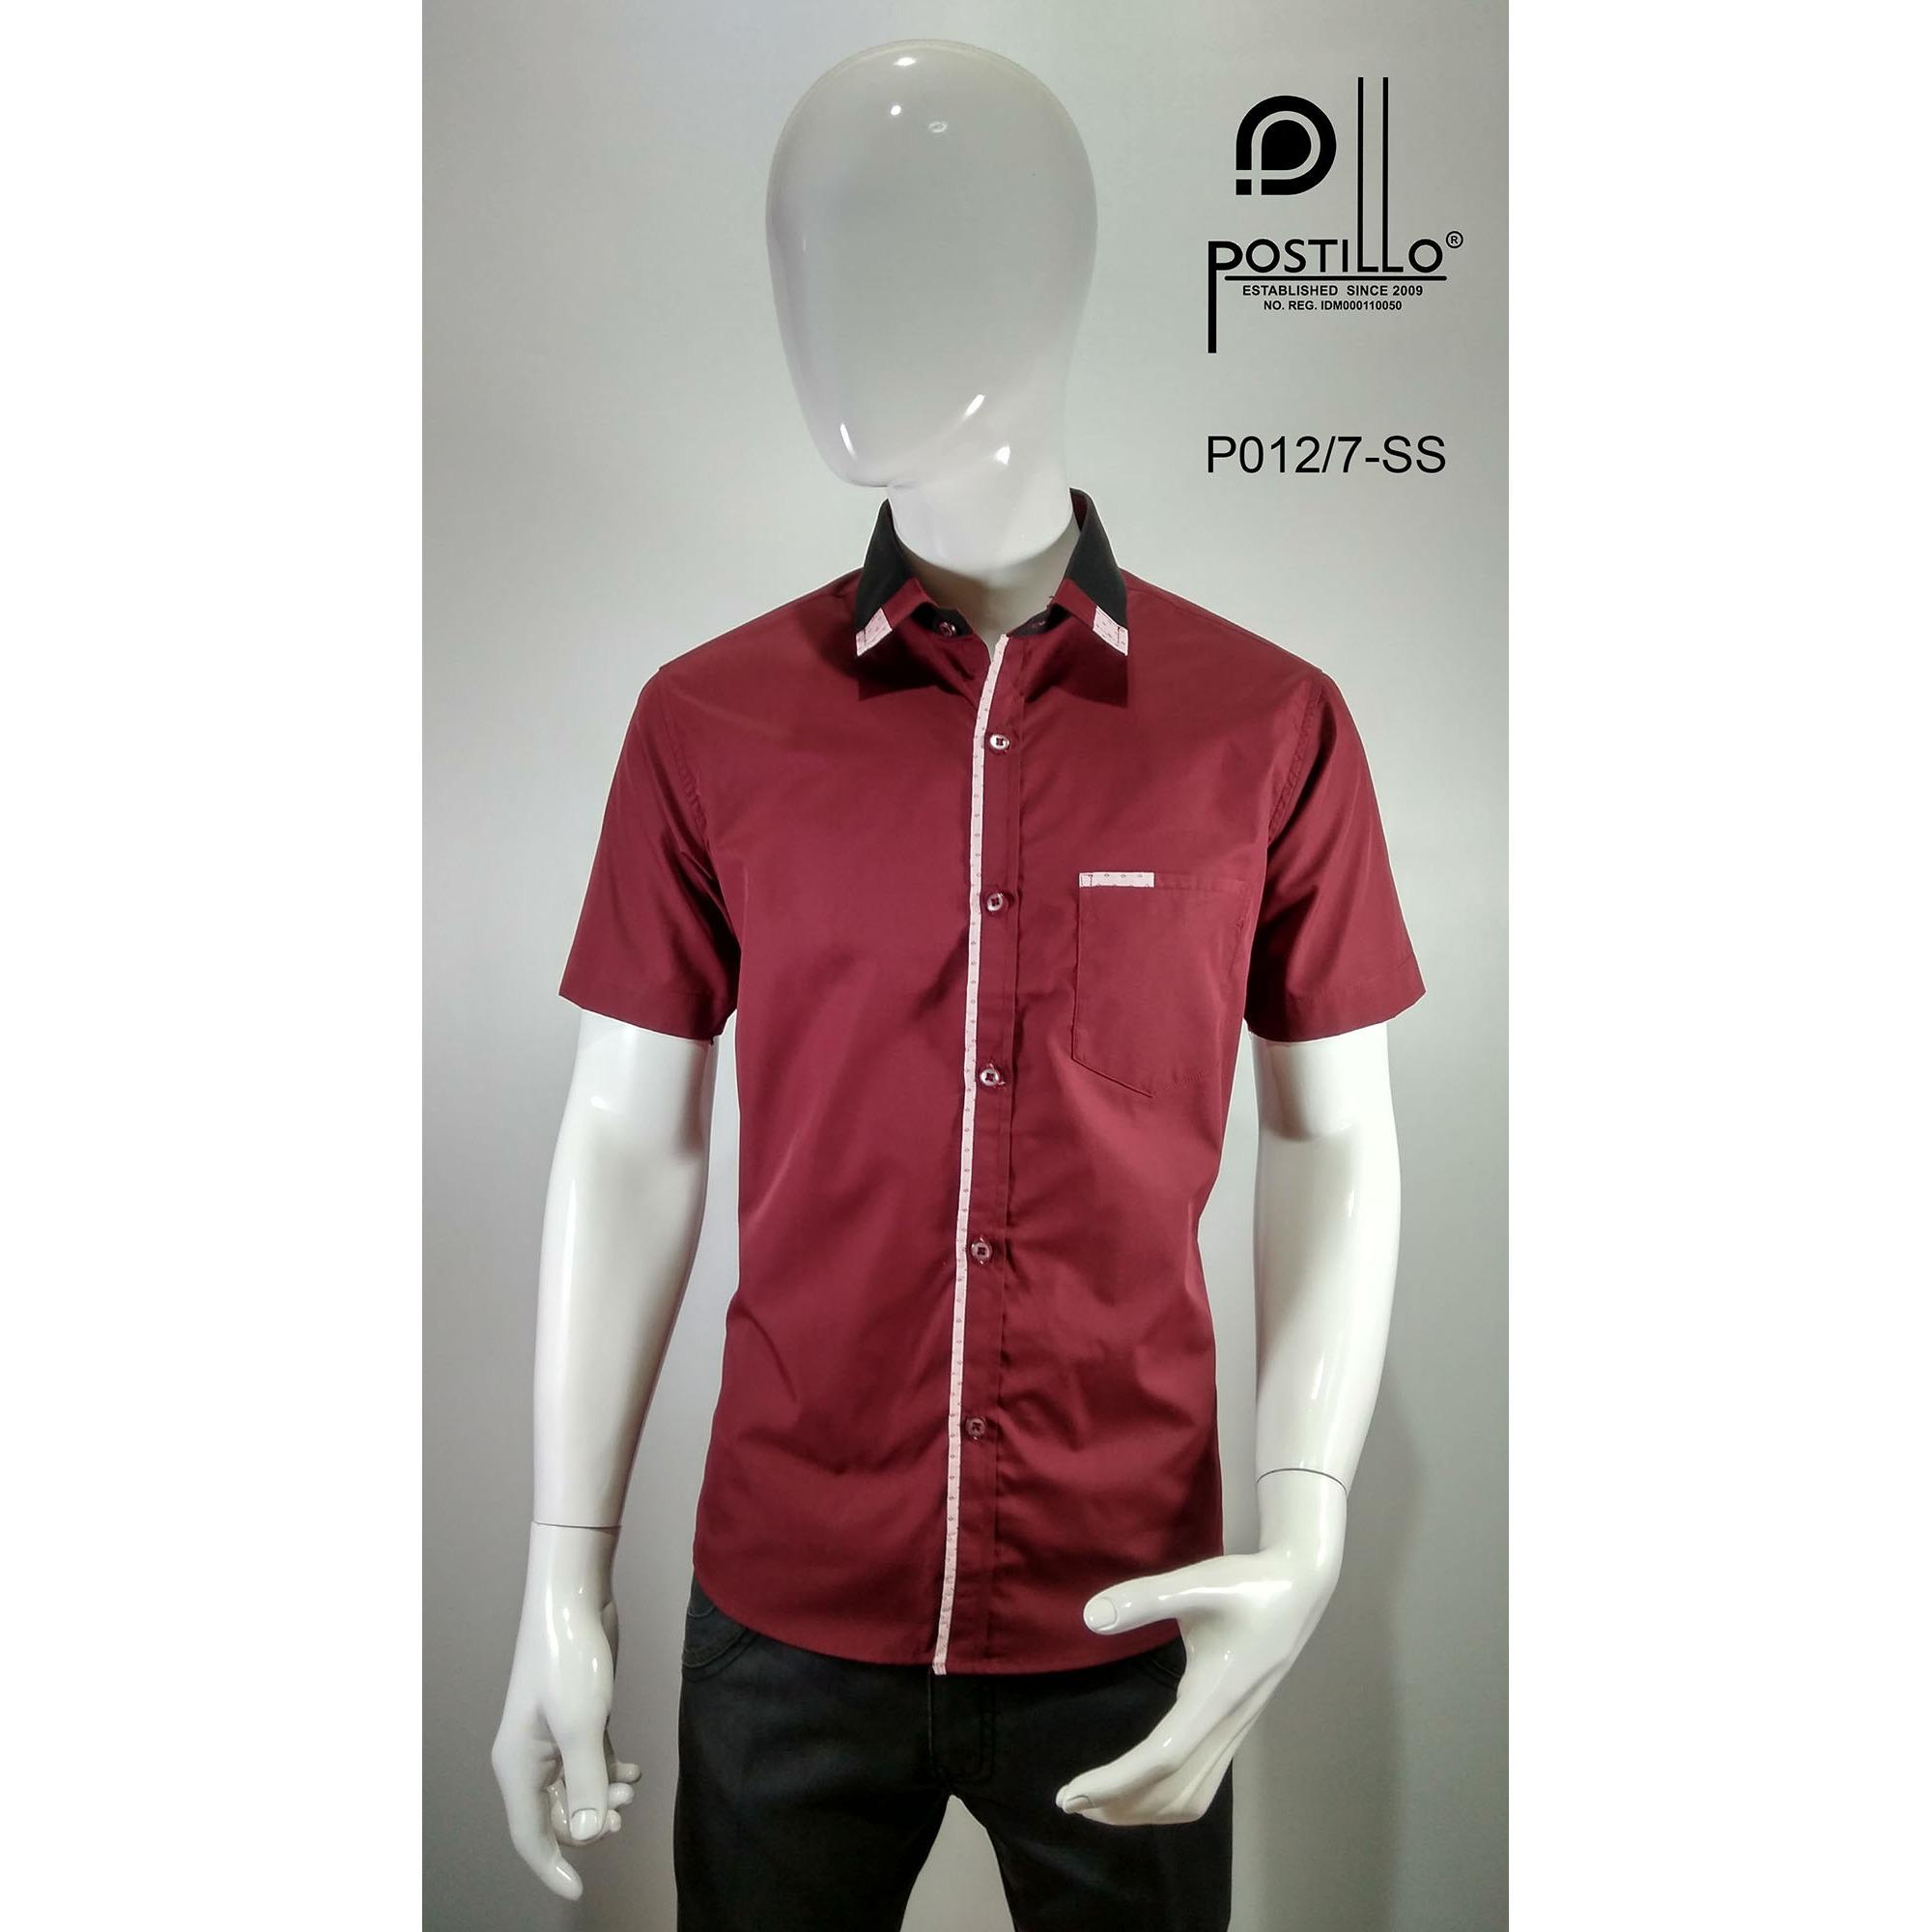 Kemeja Fashion Pria Slim Fit Postillo P012-7-SS